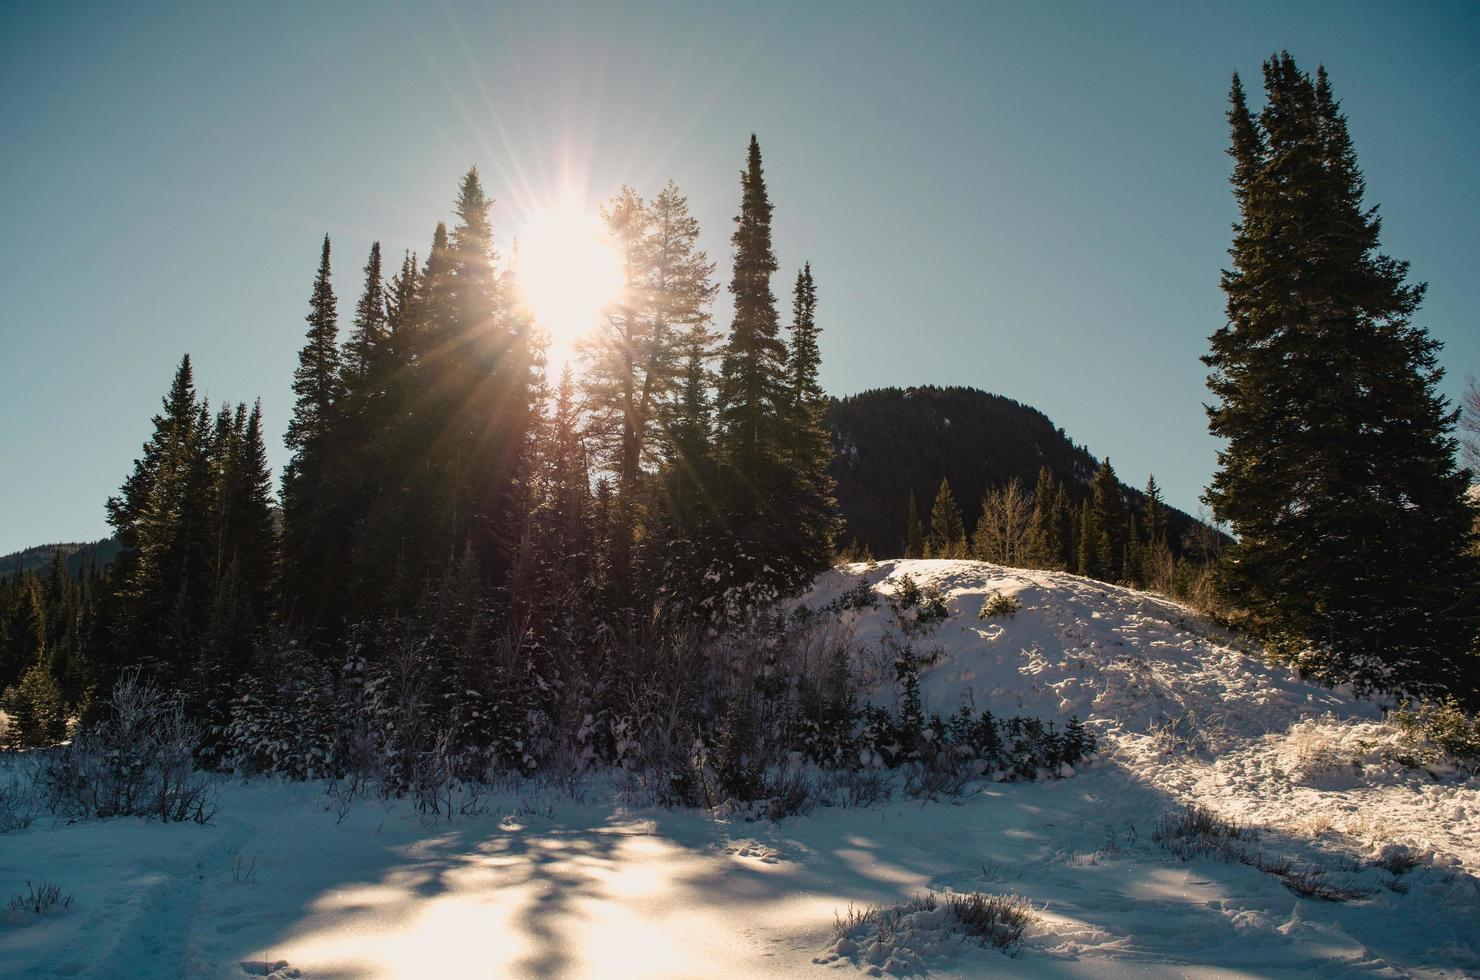 Sun shining through trees on hill top photo